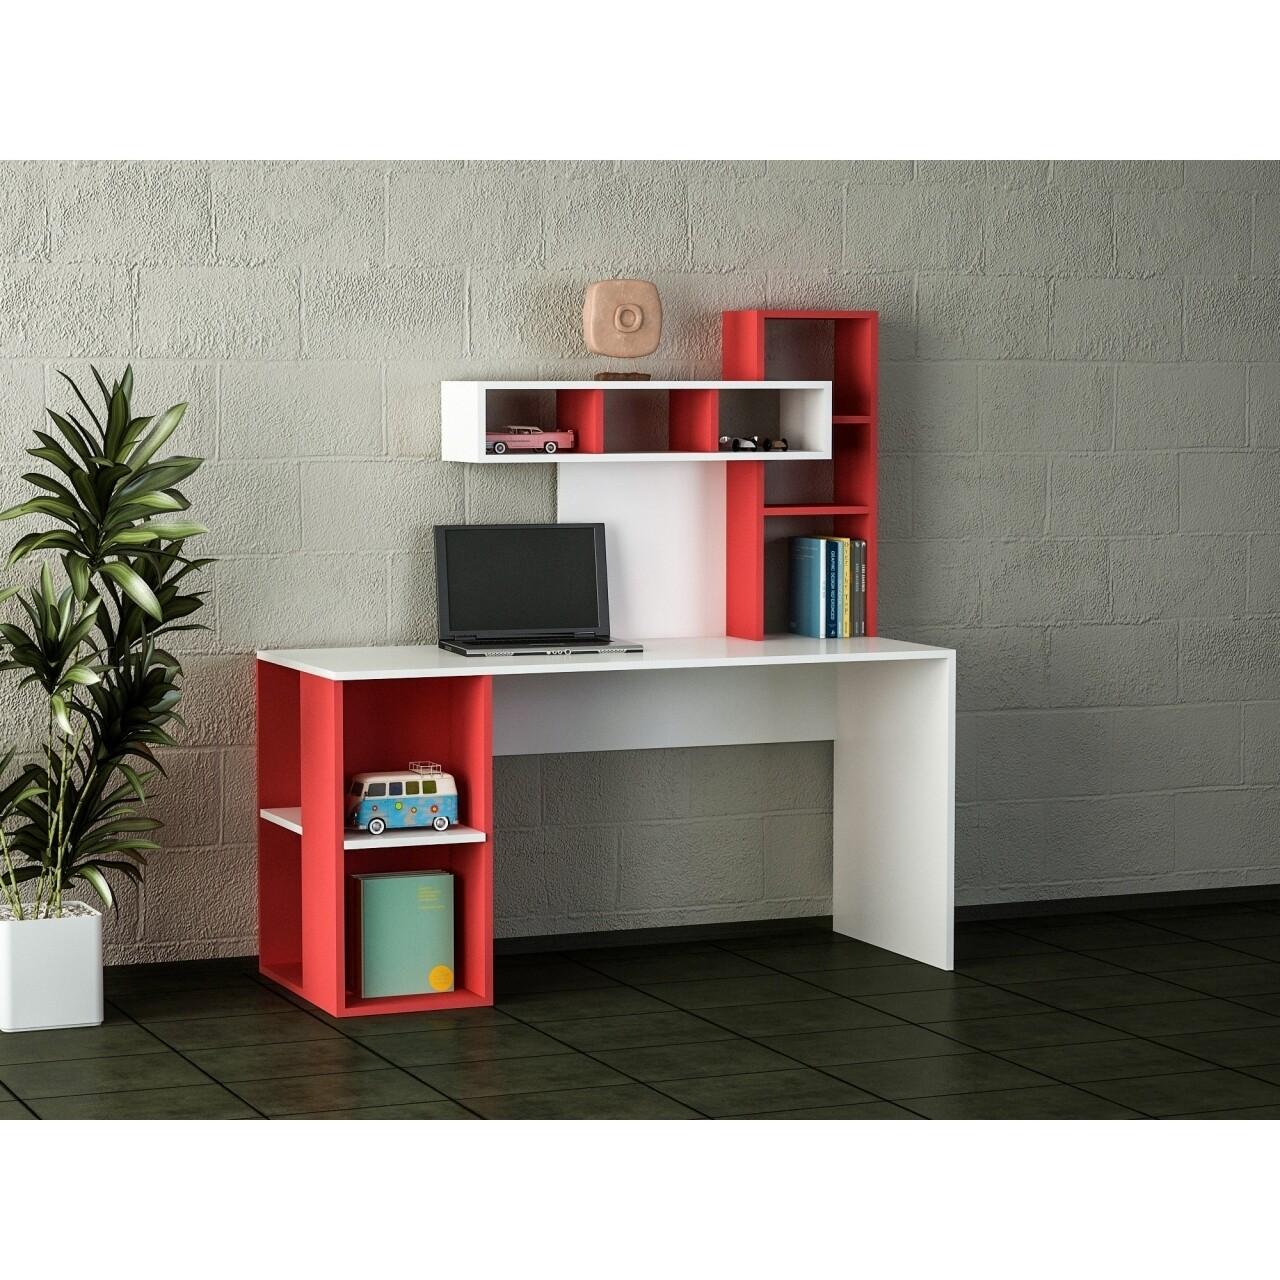 Birou Wooden Art, Coral White Red, 140x153.8x60 cm